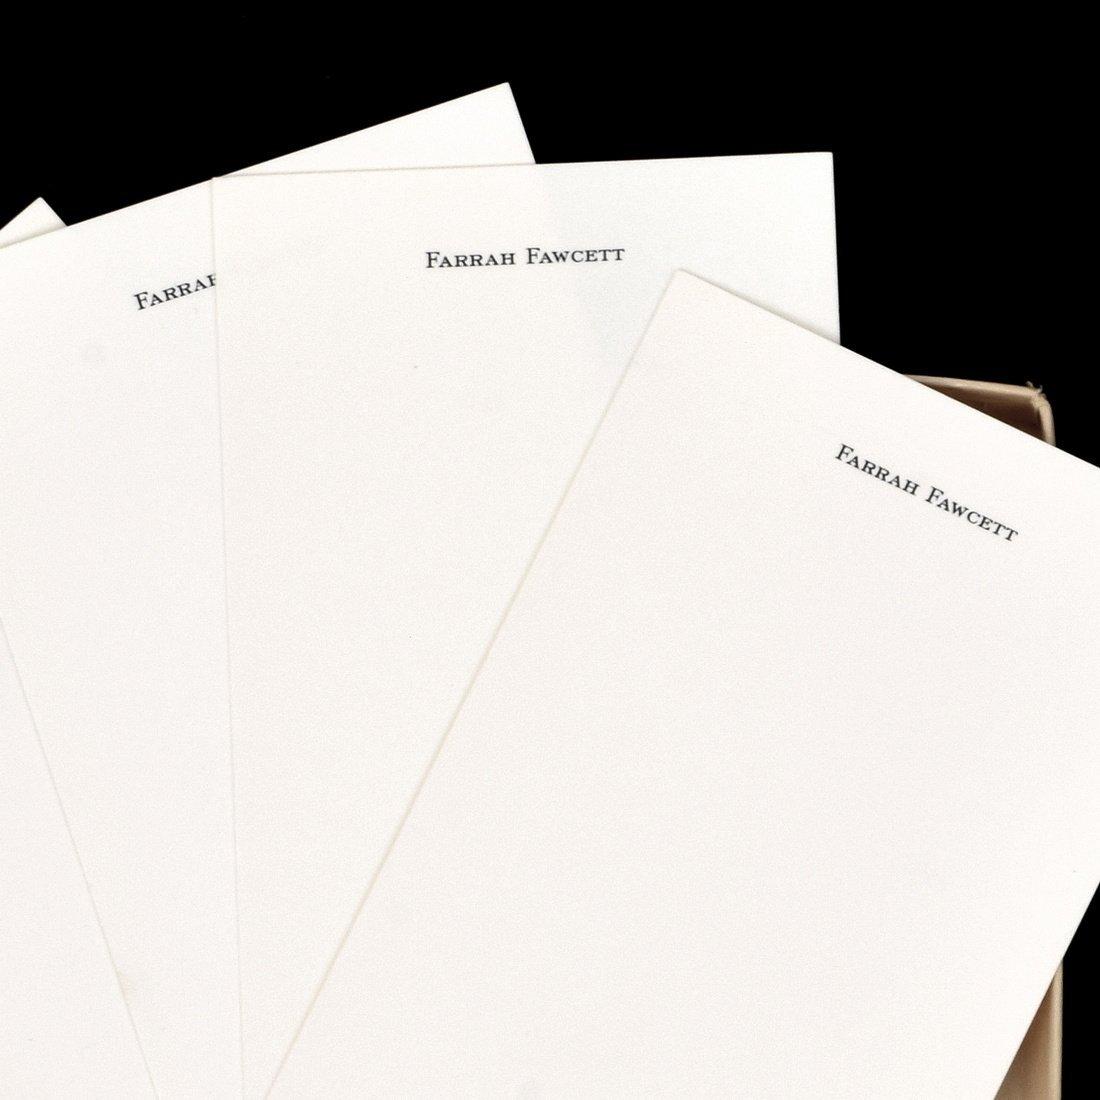 Farrah Fawcett Personal Monogrammed Stationery